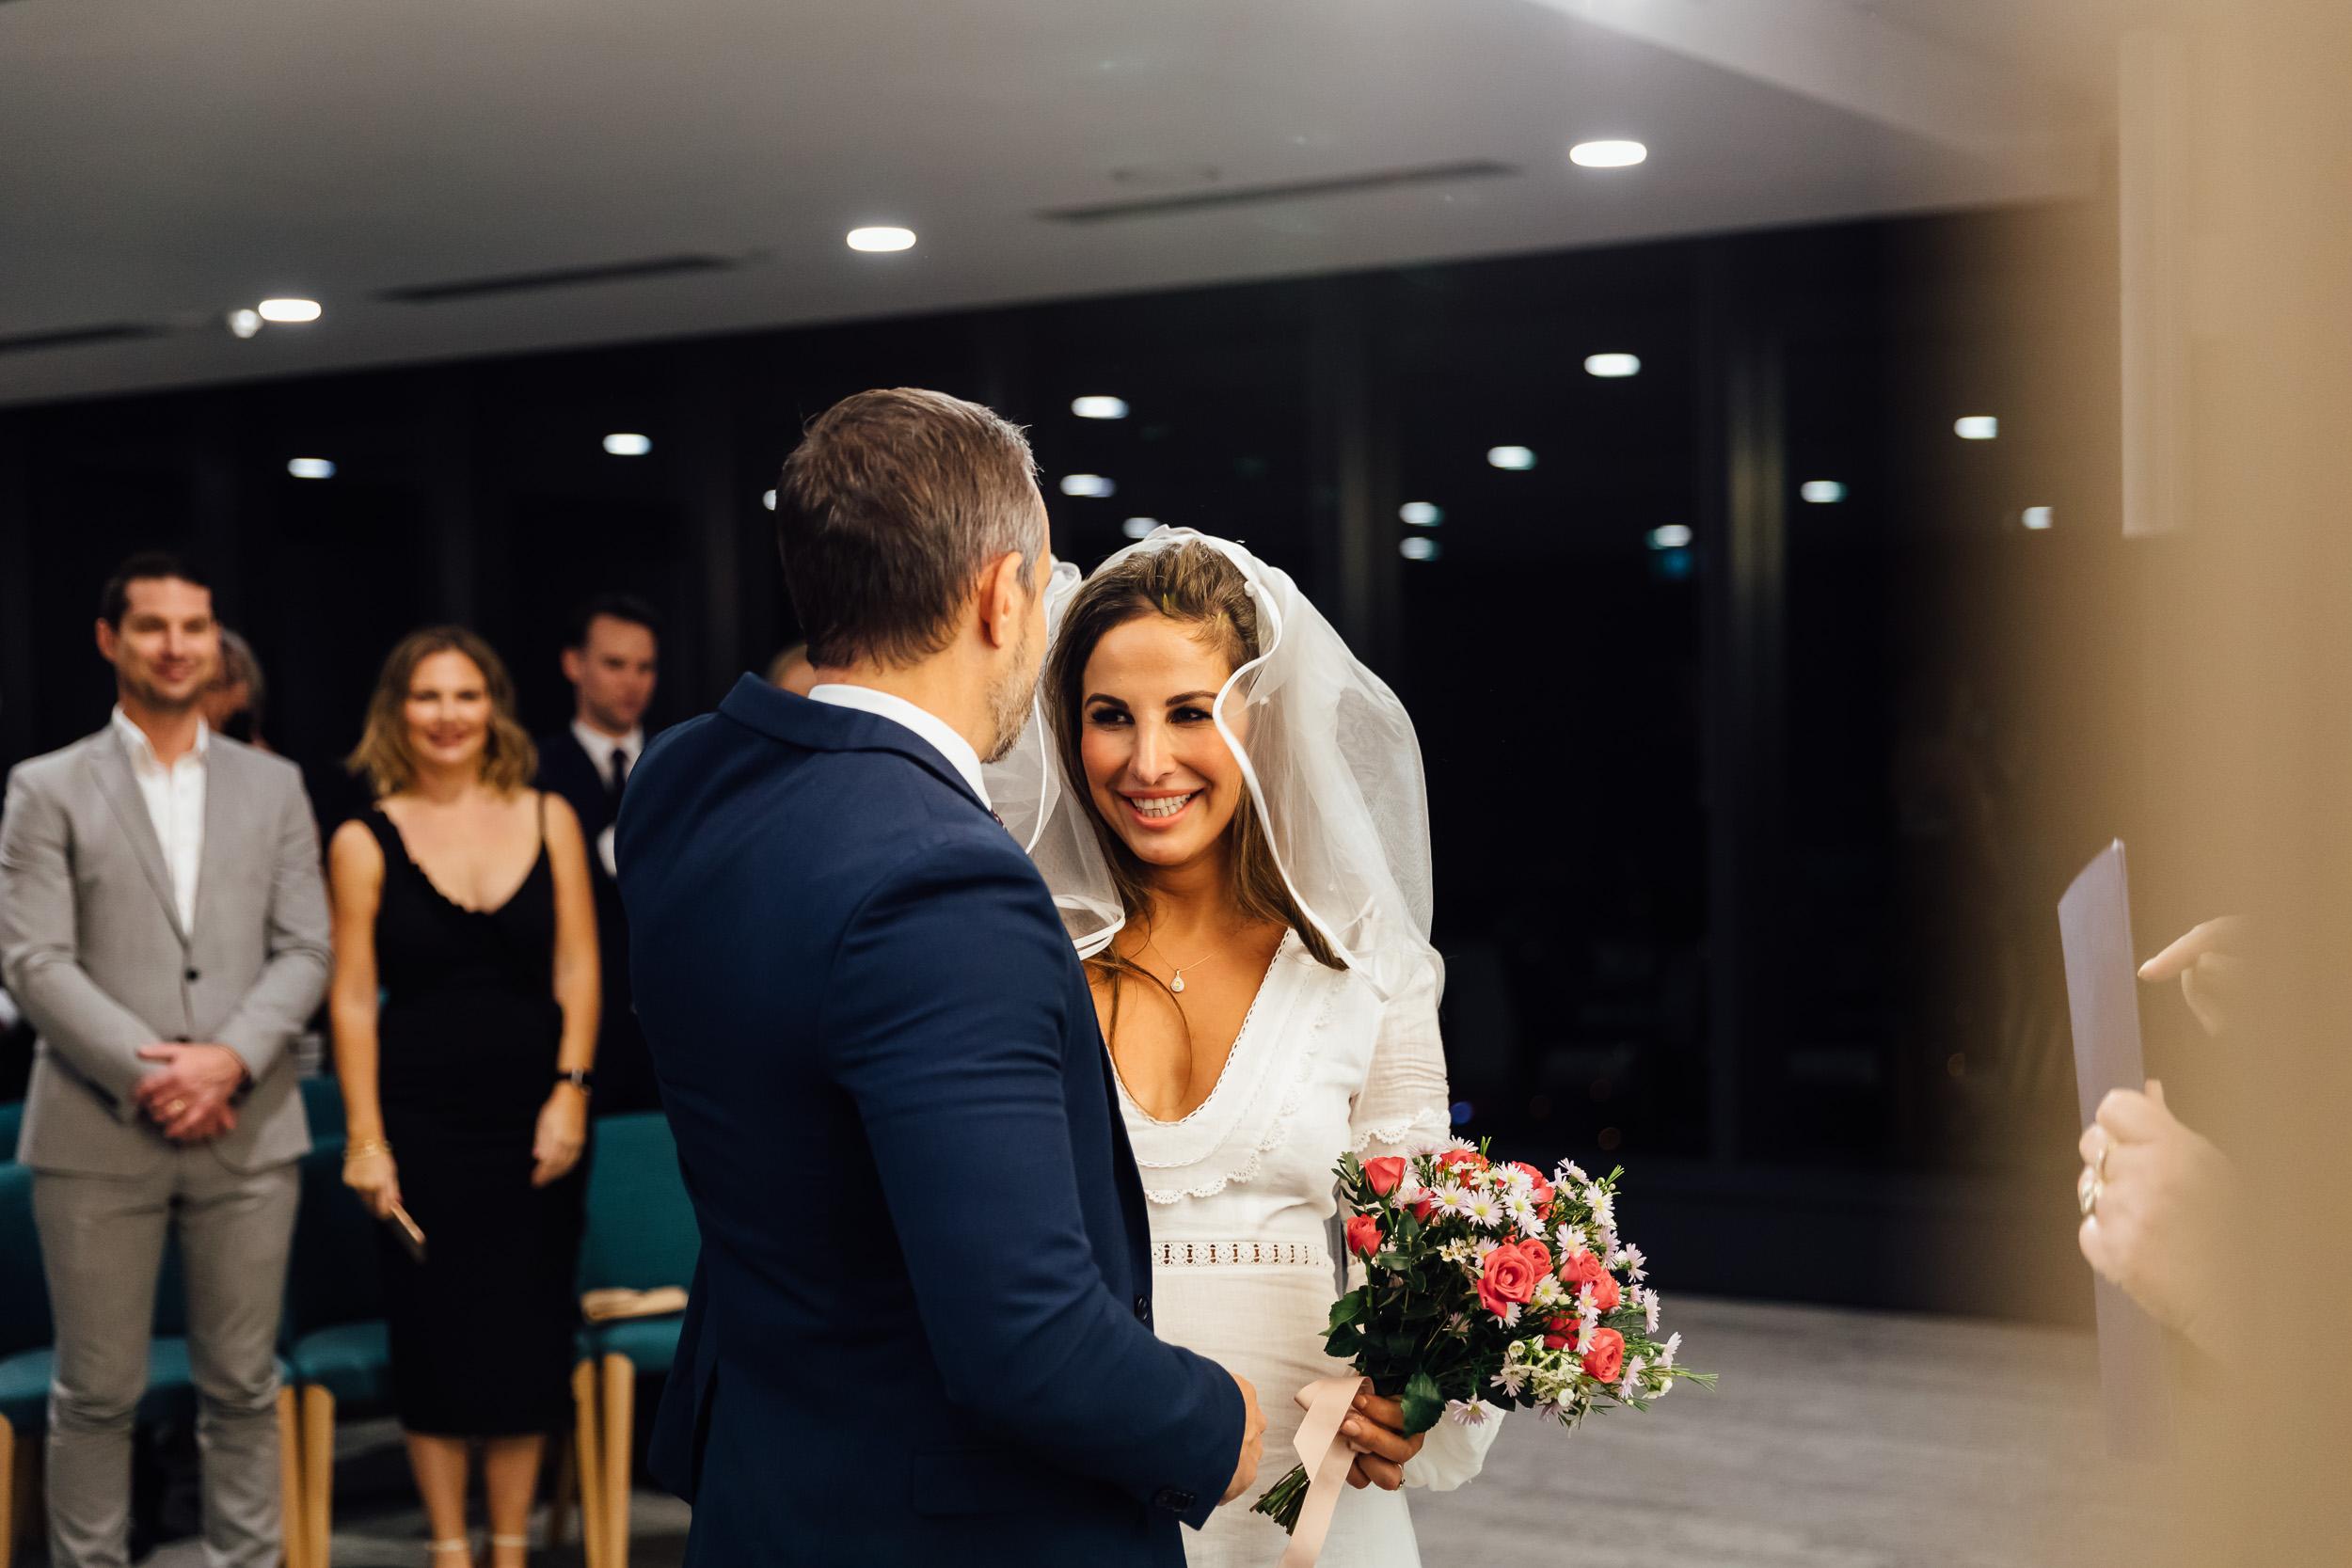 brisbane-registry-wedding-september-2018-12.jpg